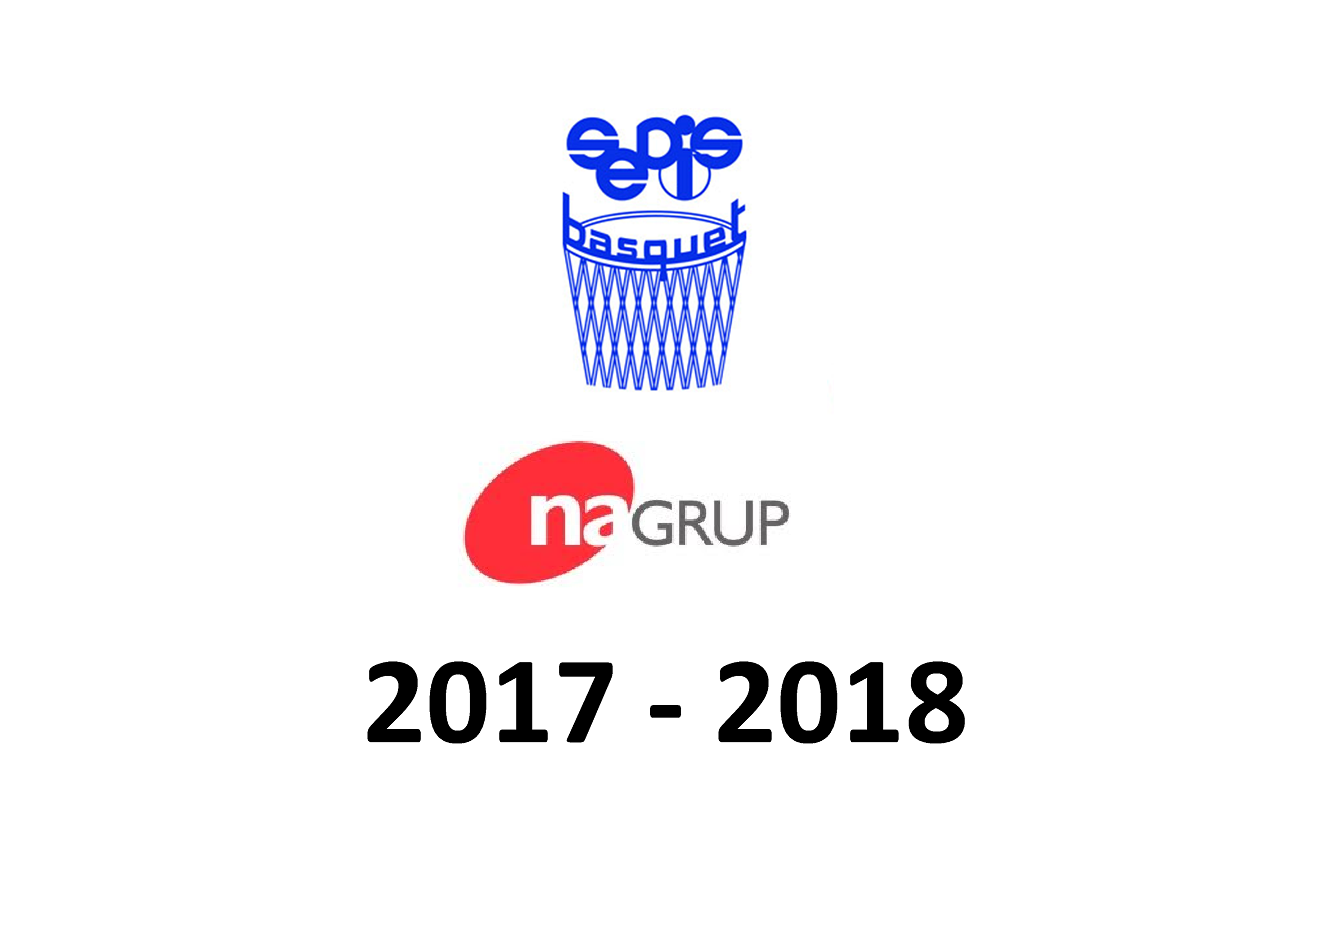 SEDIS NAGRUP 2017/2018